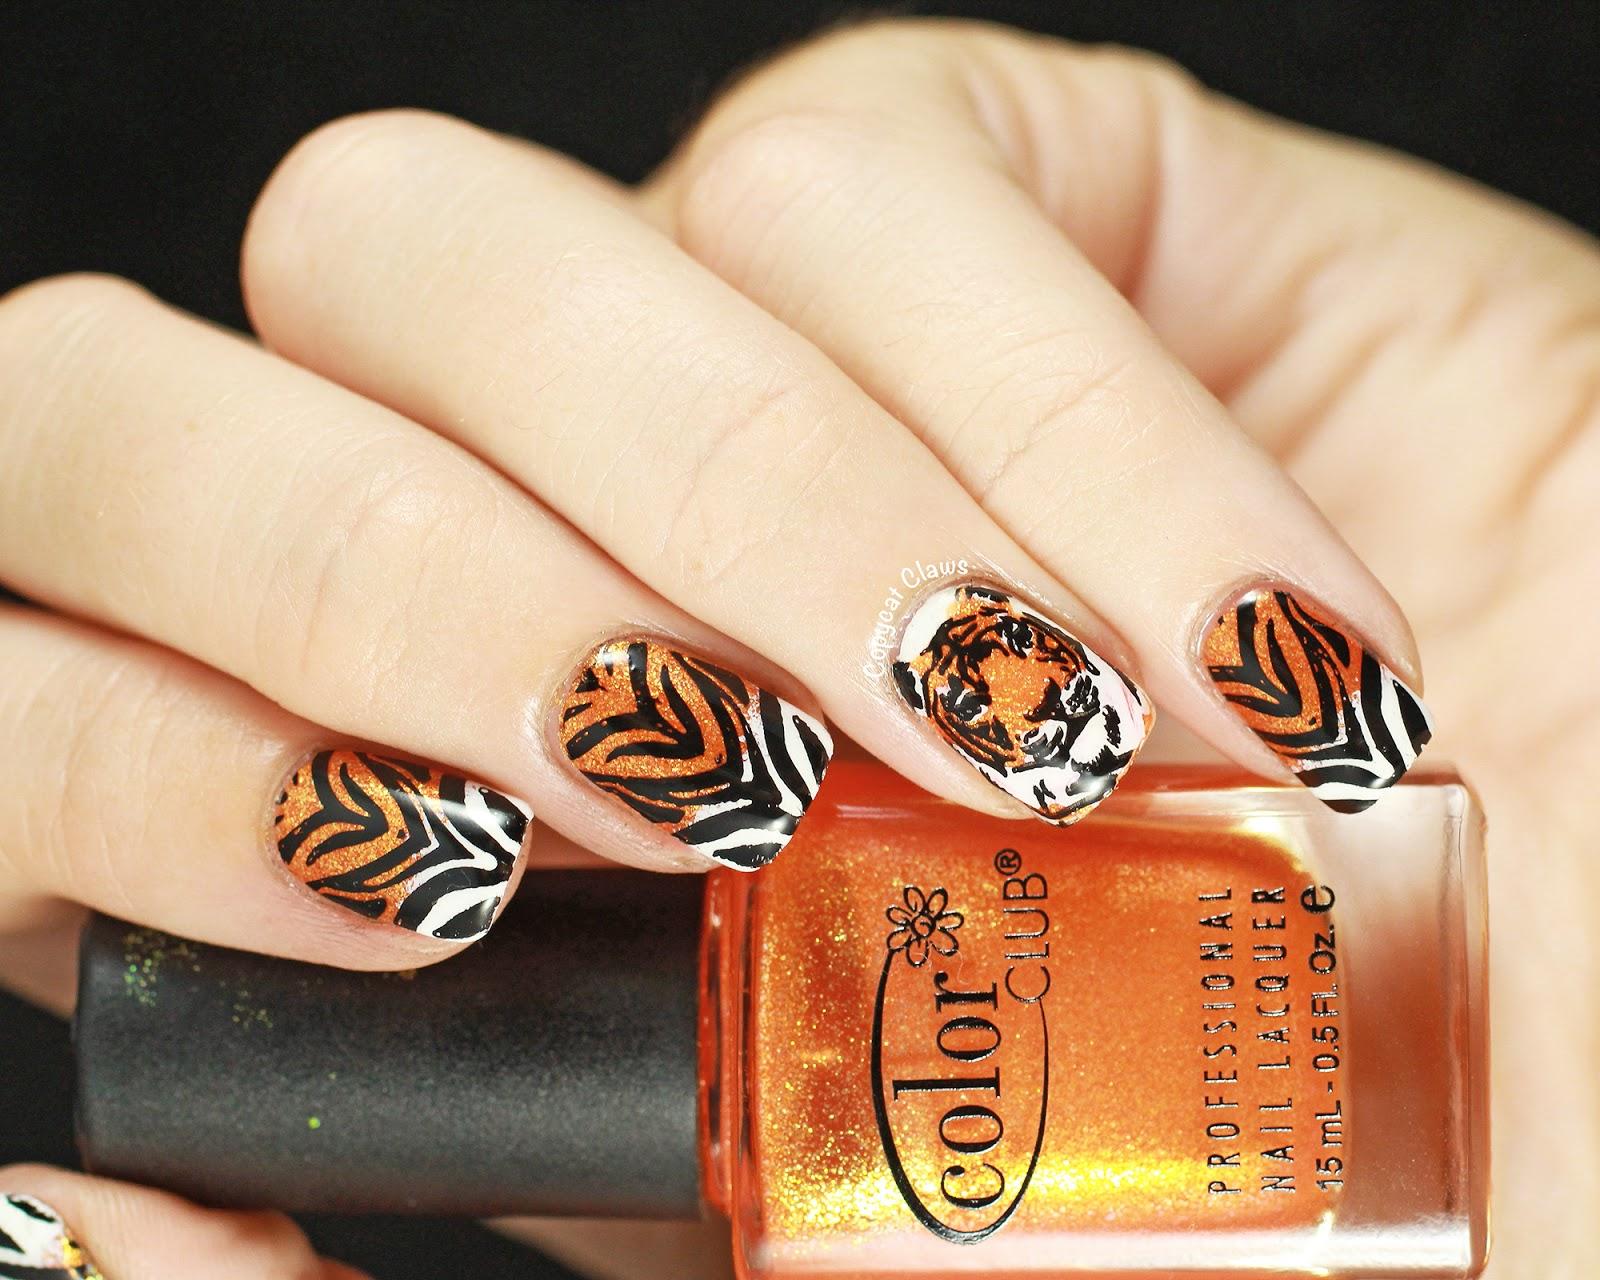 Рисунки на ногтях фото тигровые